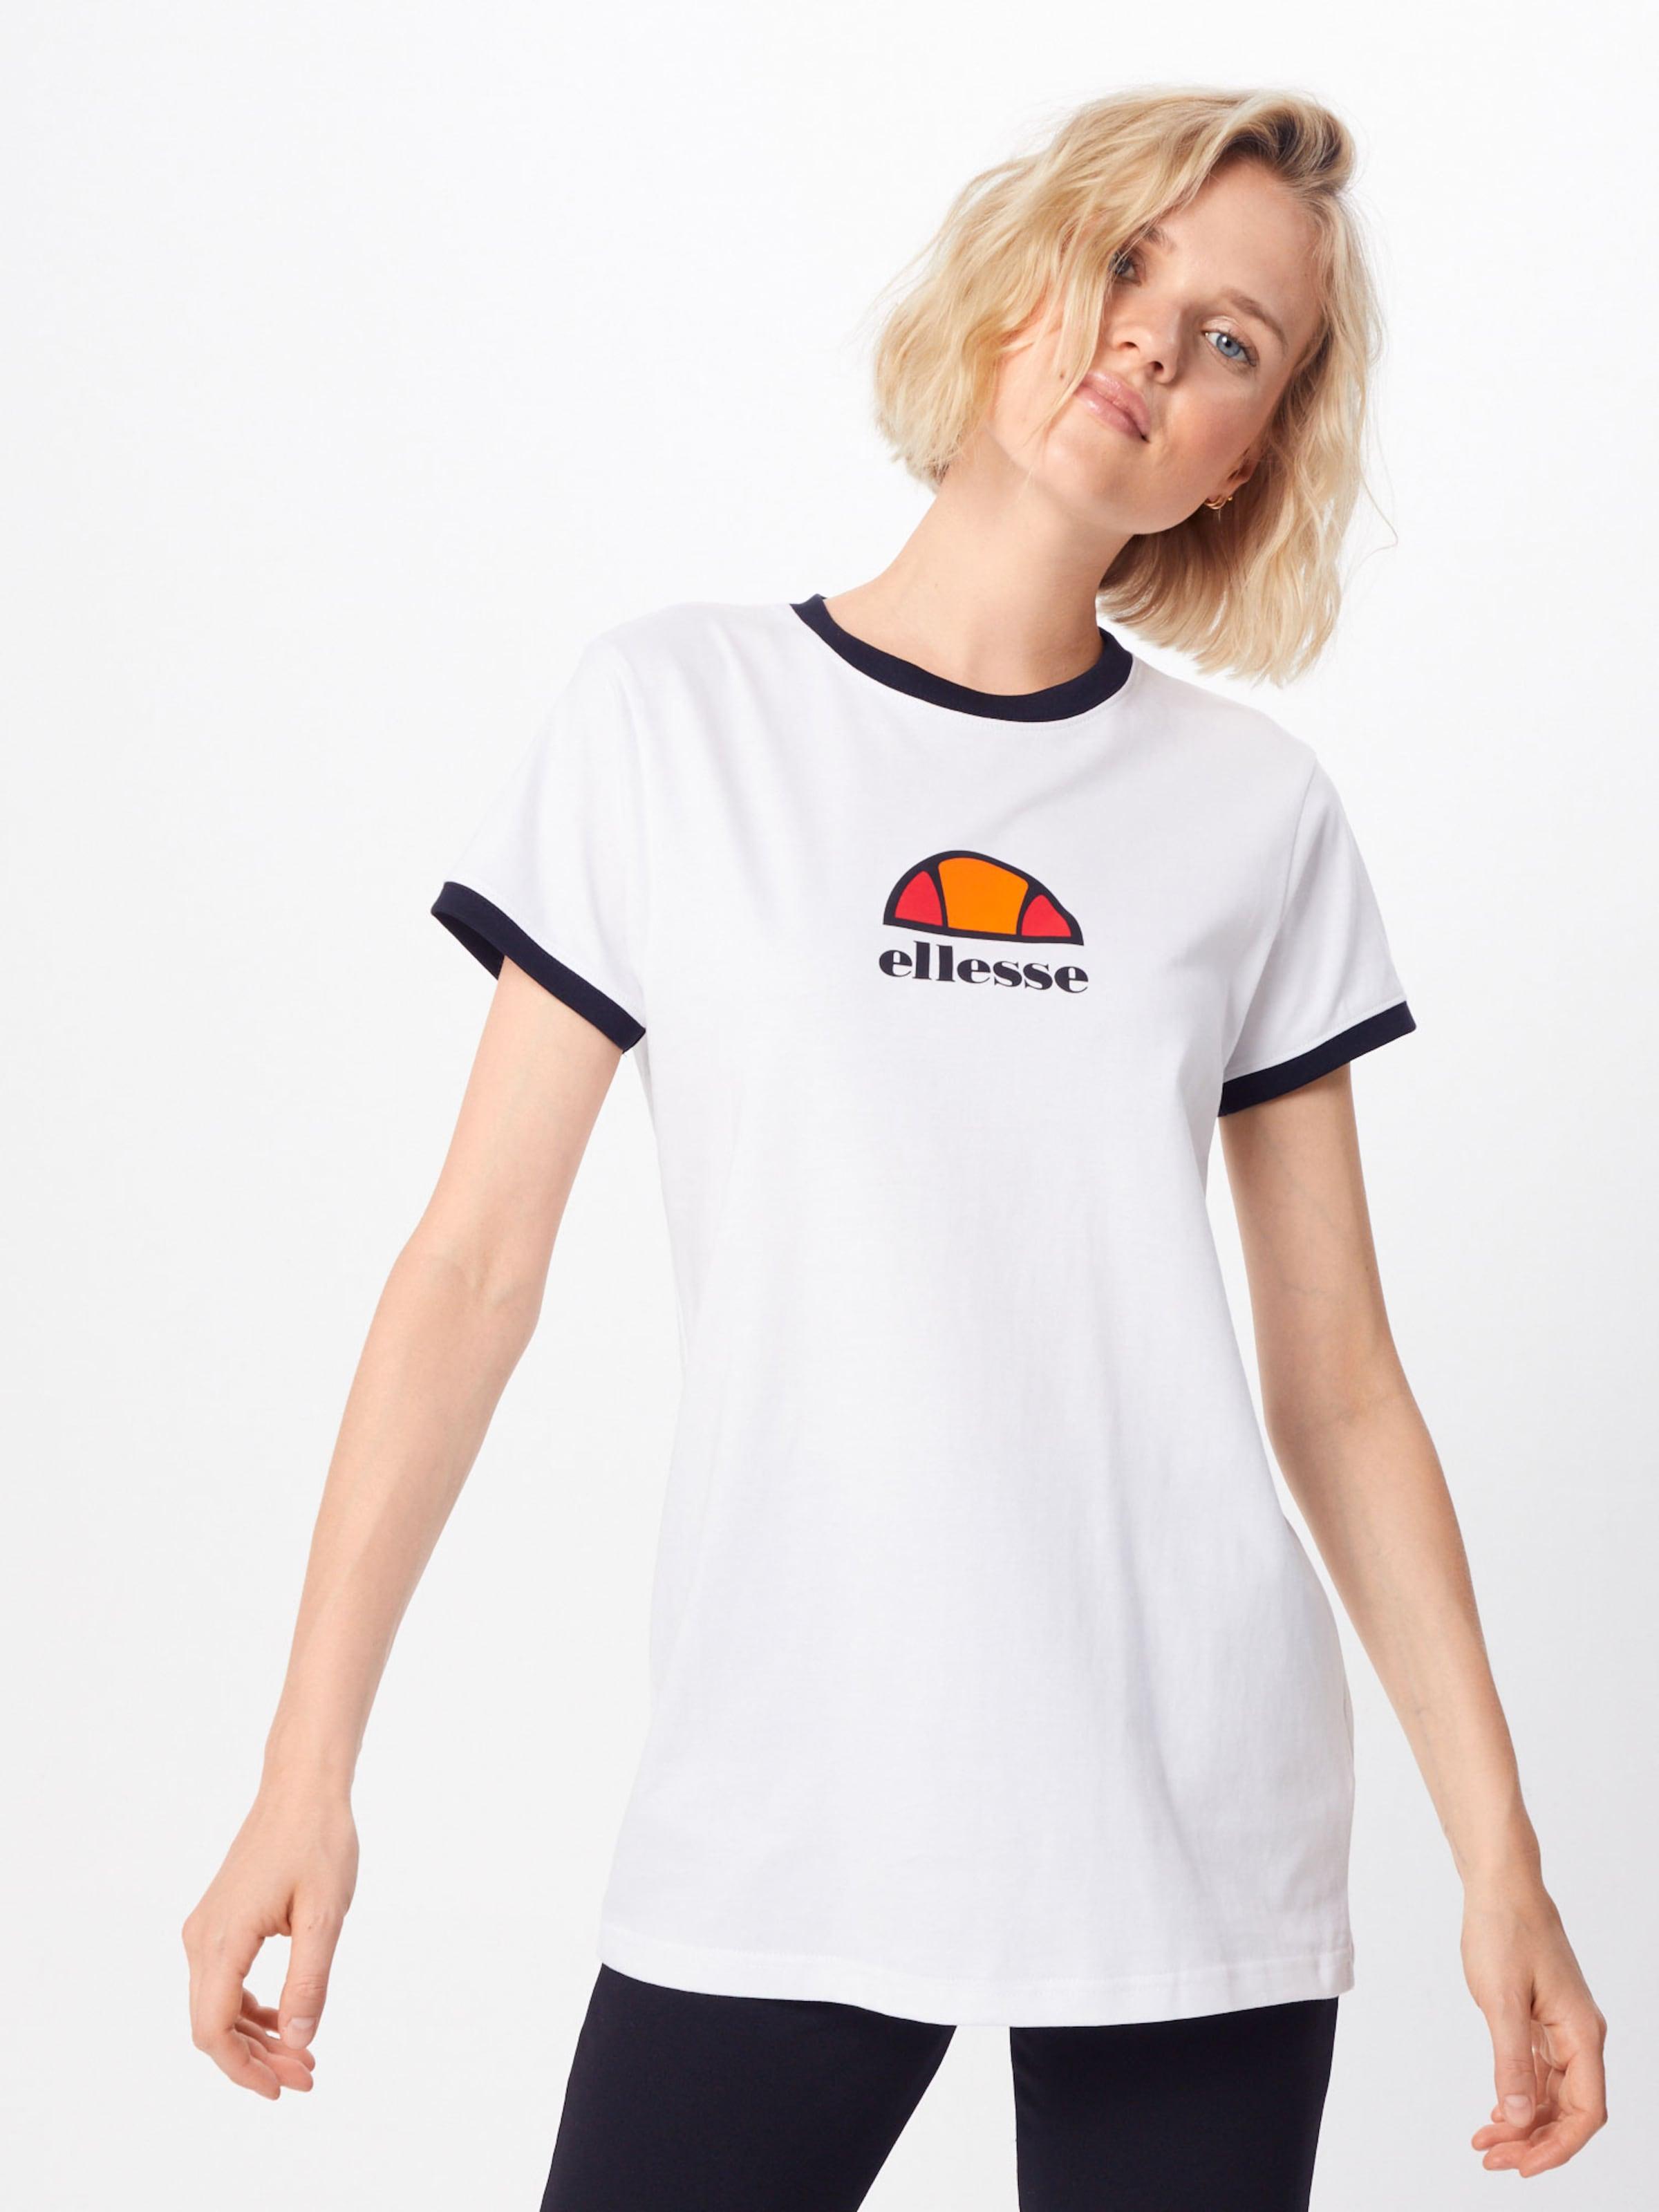 Ellesse Shirt In Shirt 'orlanda' In Ellesse Weiß 'orlanda' Weiß SULMGzpqV